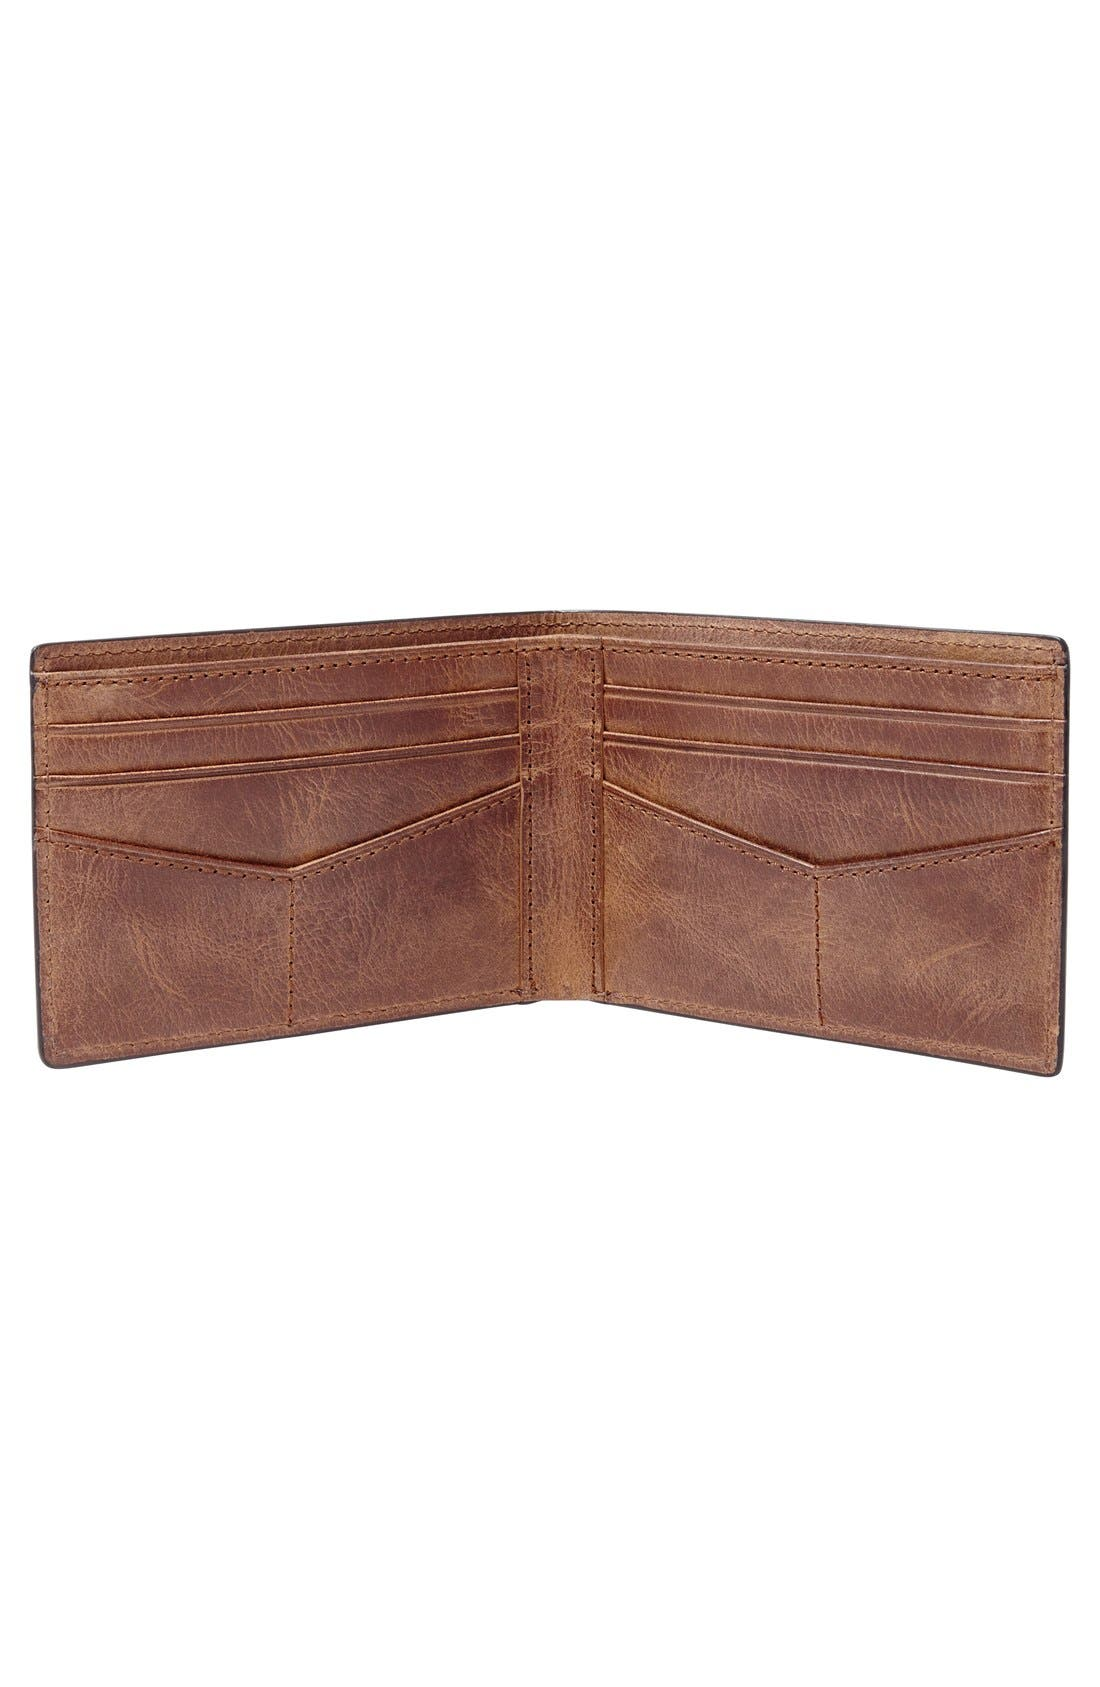 FOSSIL, 'Derrick' Leather Front Pocket Bifold Wallet, Alternate thumbnail 2, color, BROWN